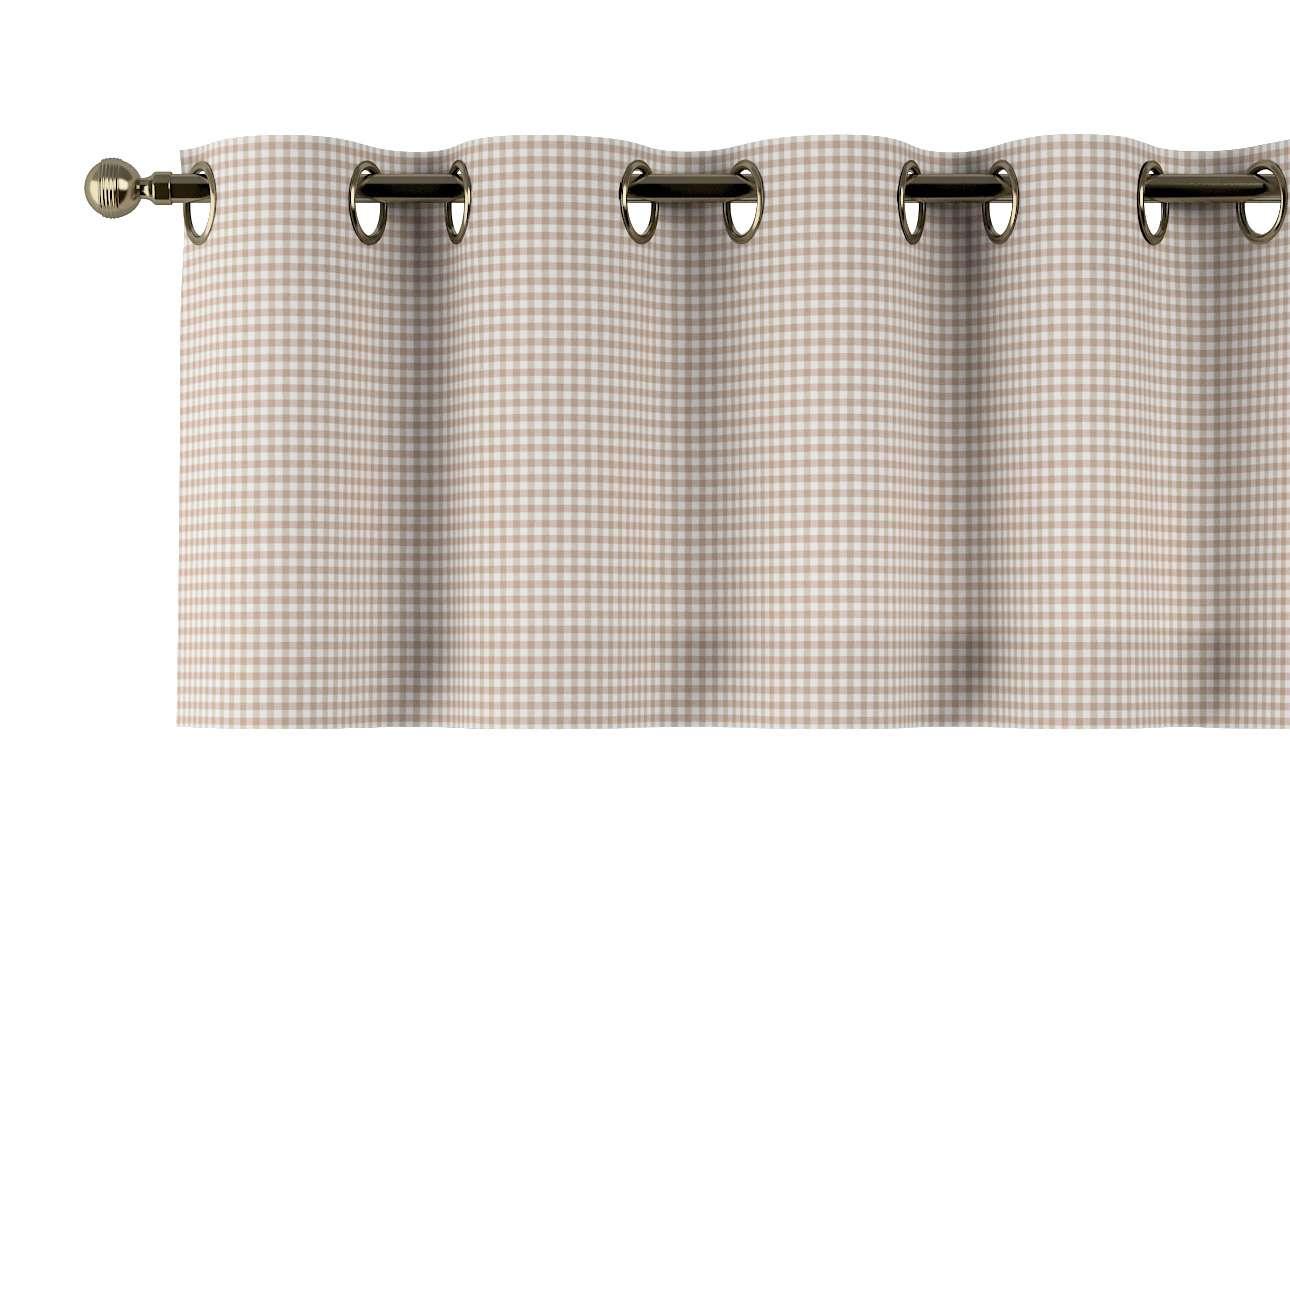 Lambrekin na kroužcích  130x40cm v kolekci Quadro, látka: 136-05